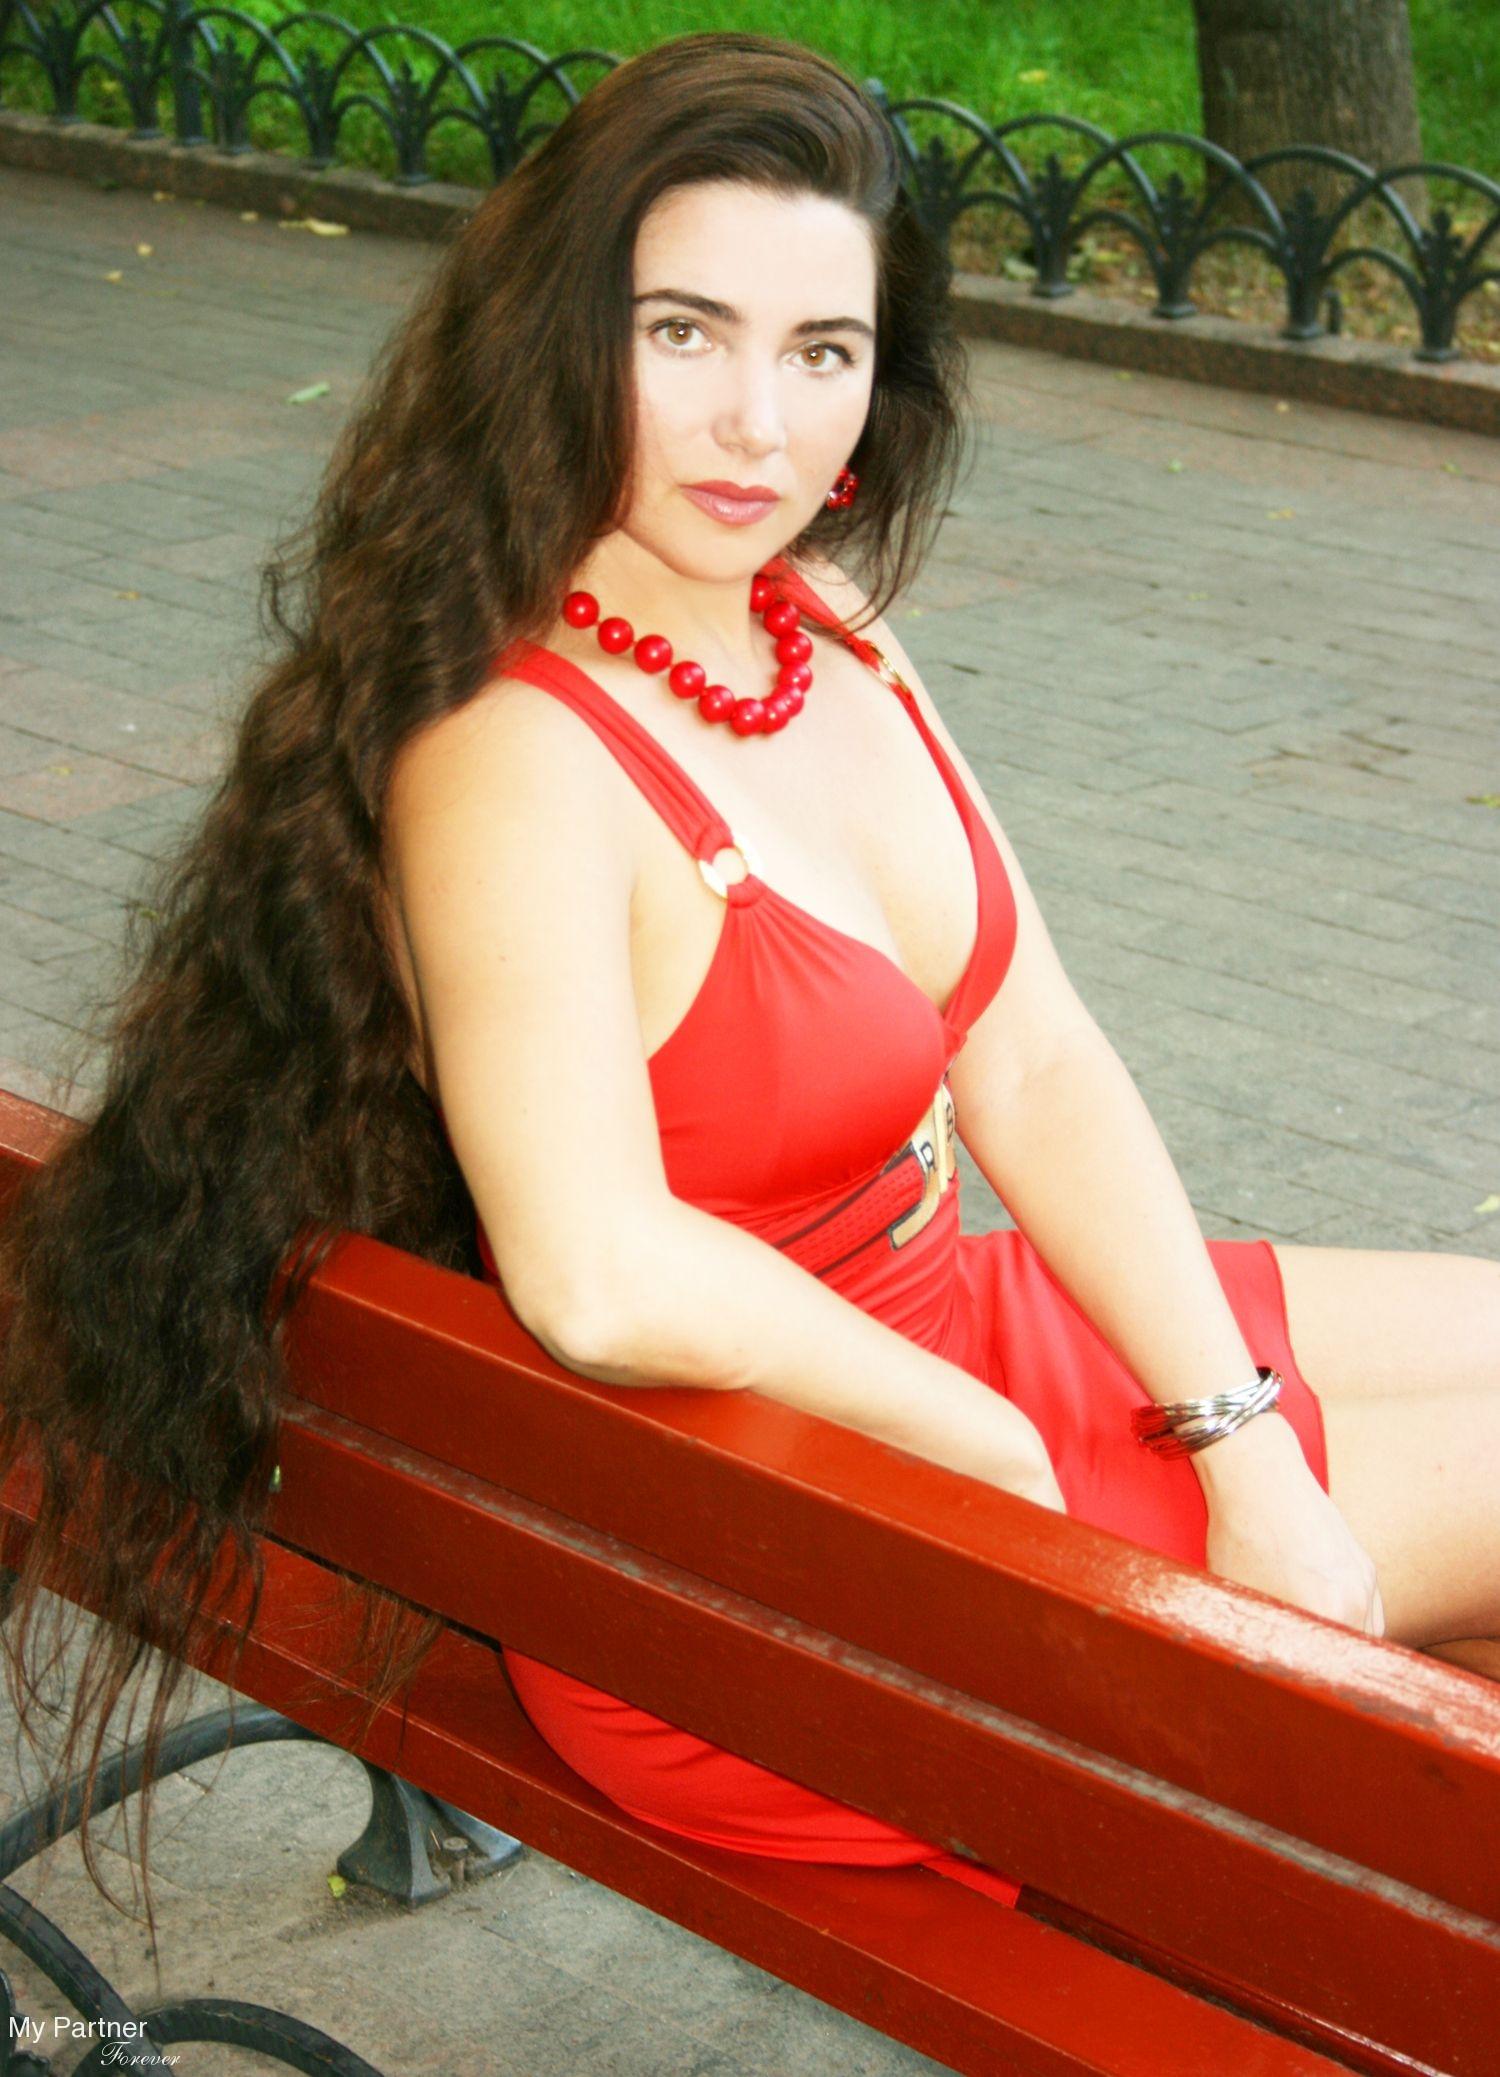 Ukrainian brides, dating agency in Odessa Ukraine